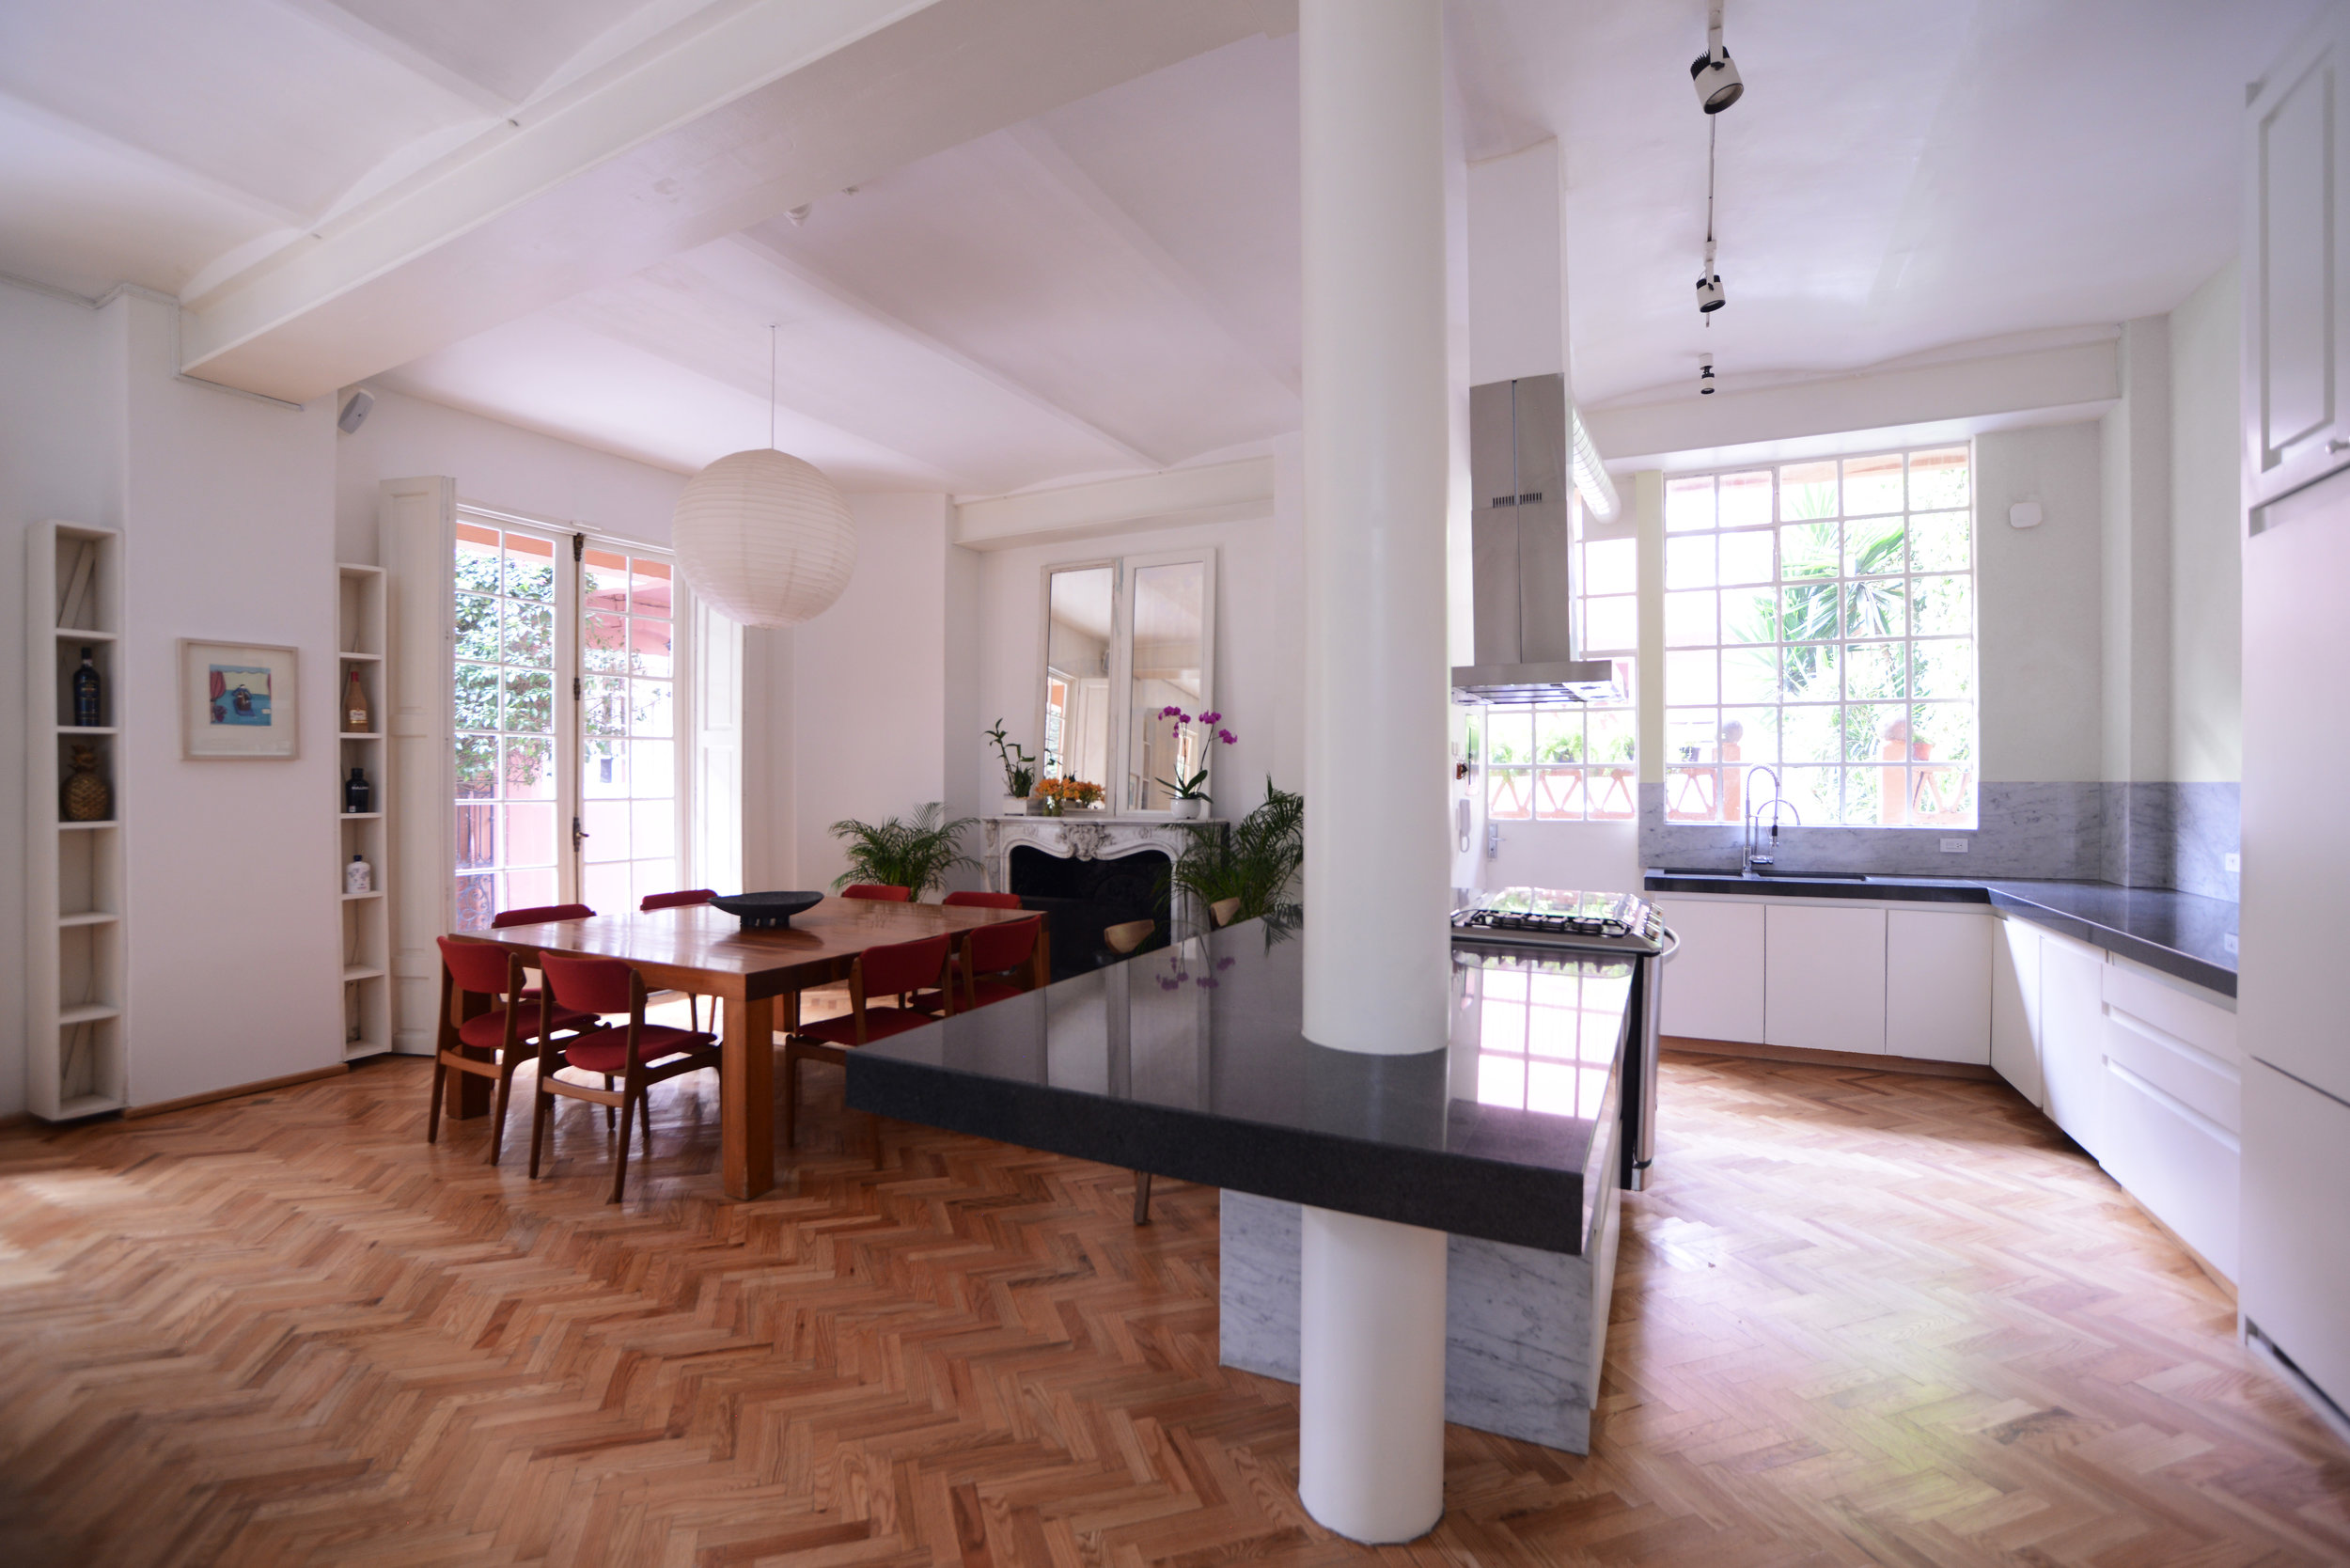 Casa Vieyra_5_BBL ARQUITECTOS.jpg